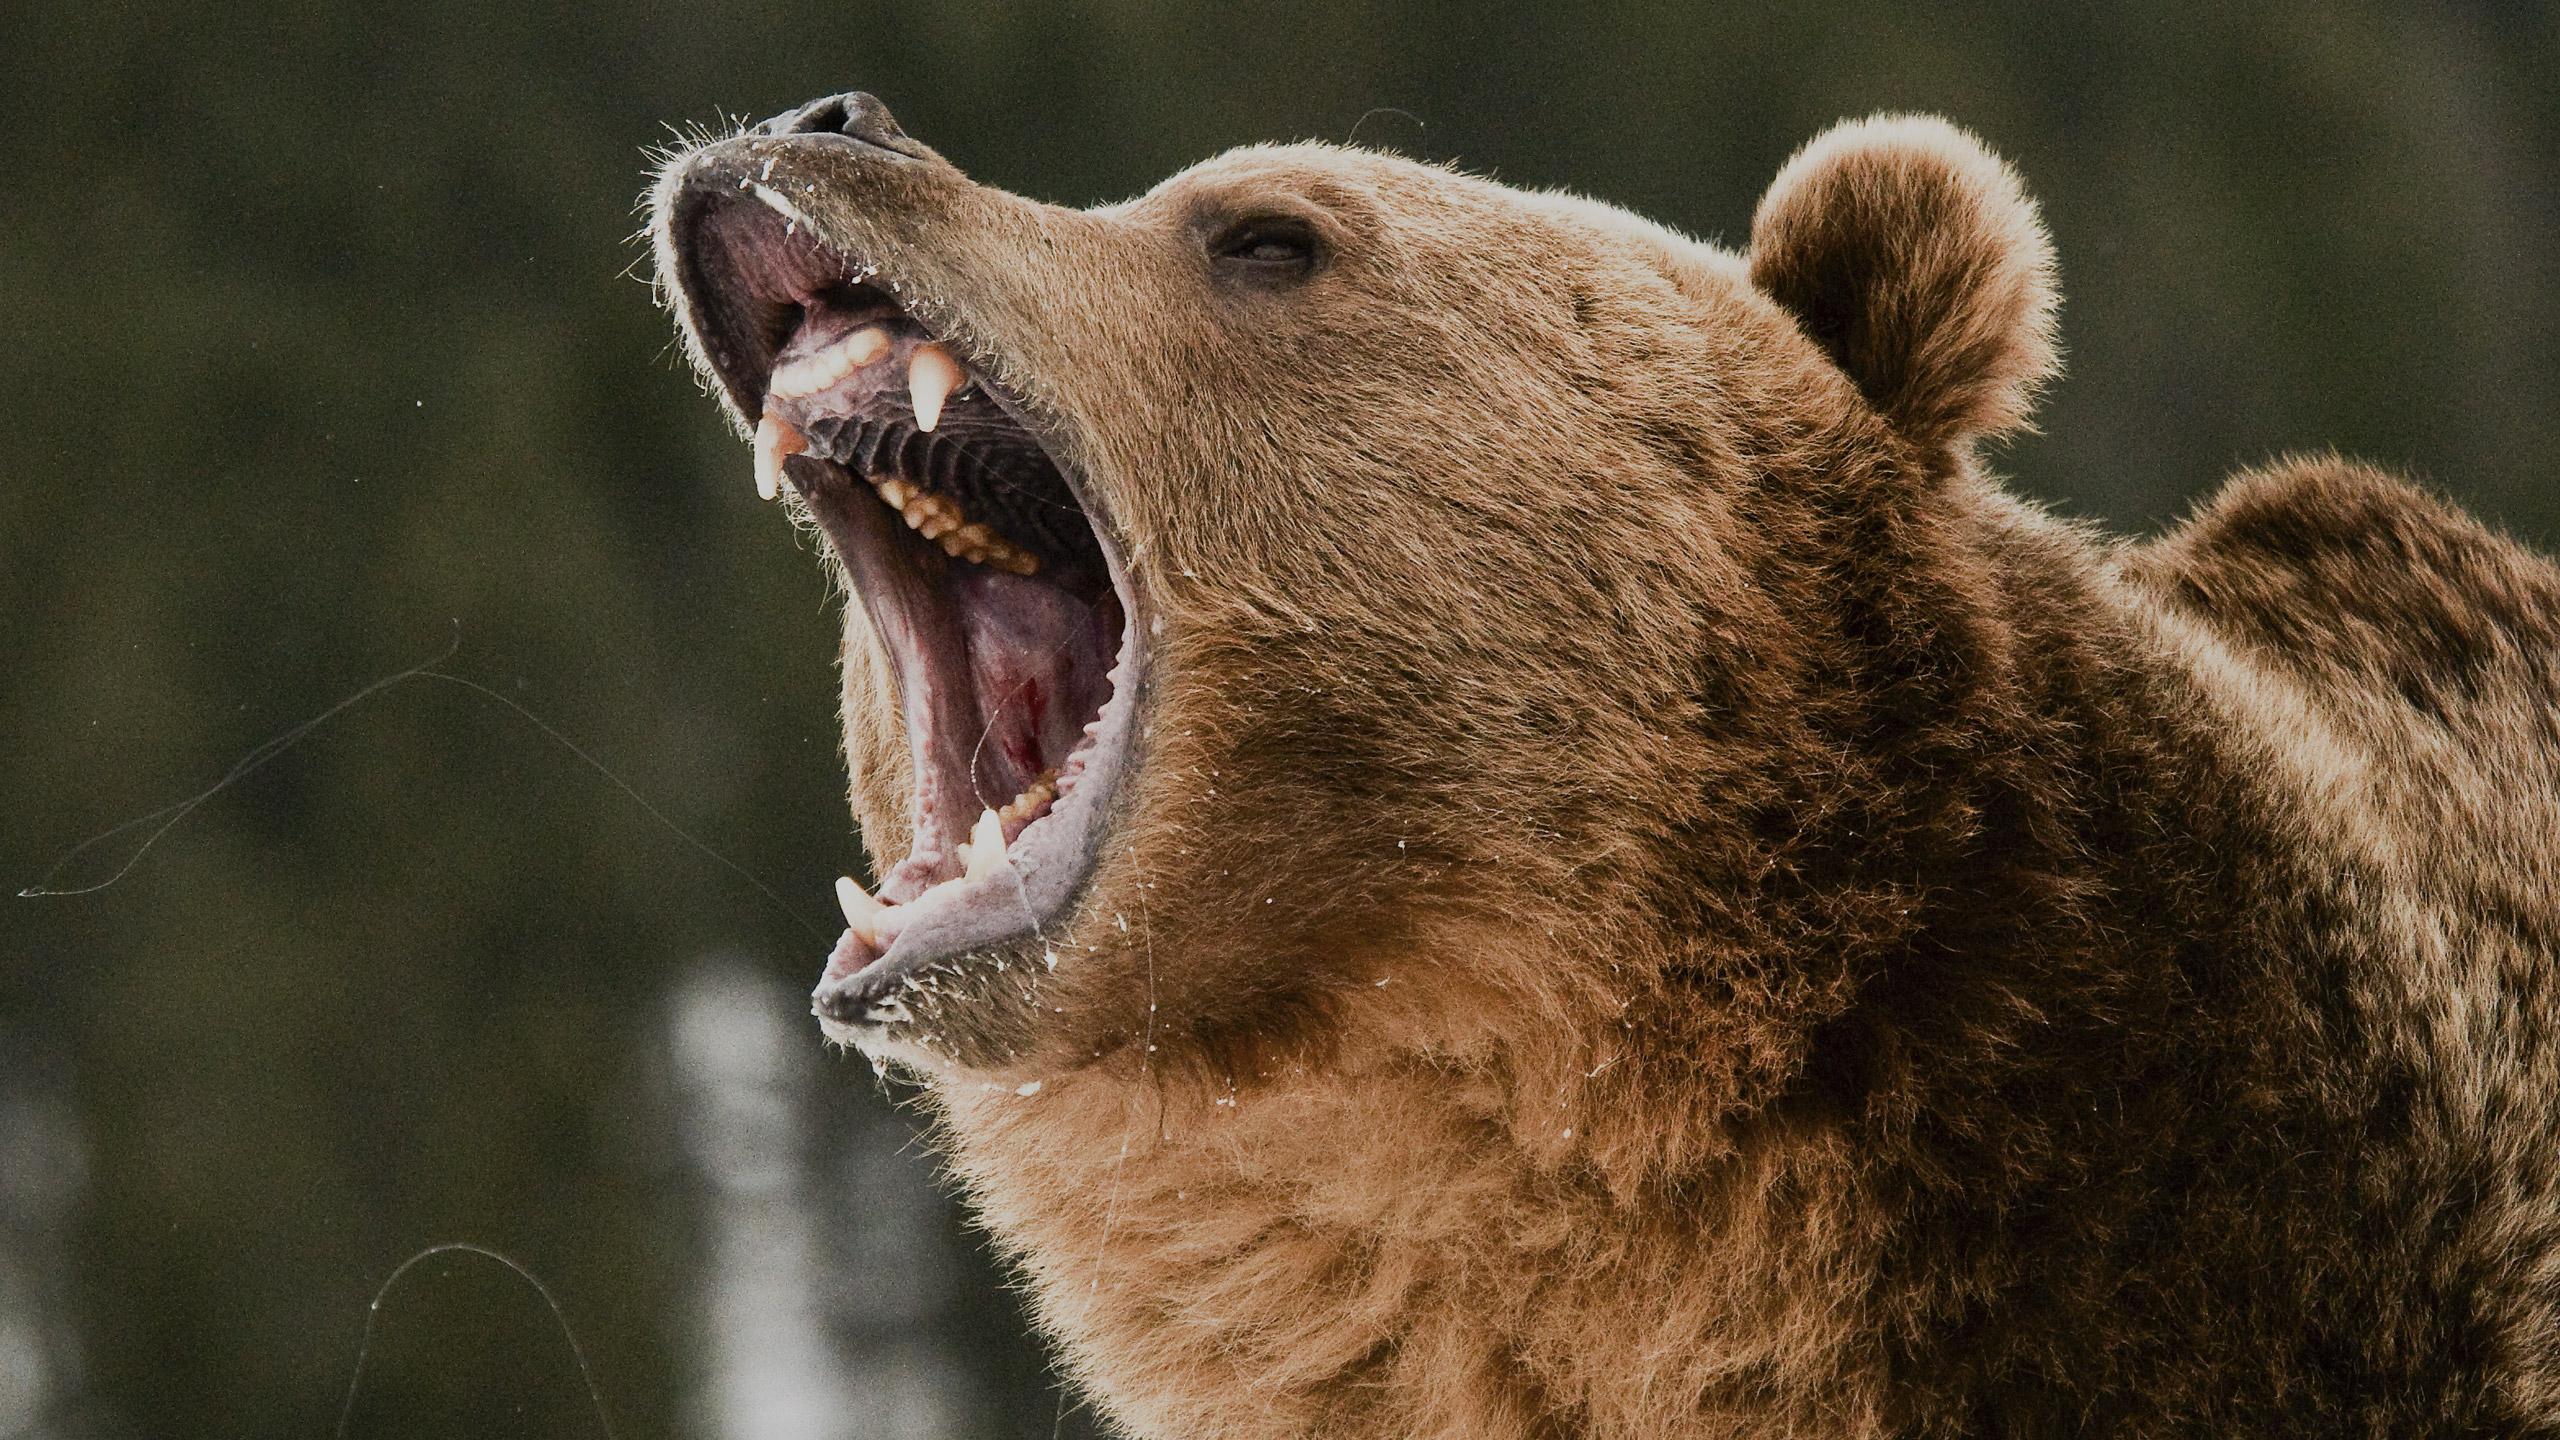 sliderbg-2540x1440px-bear